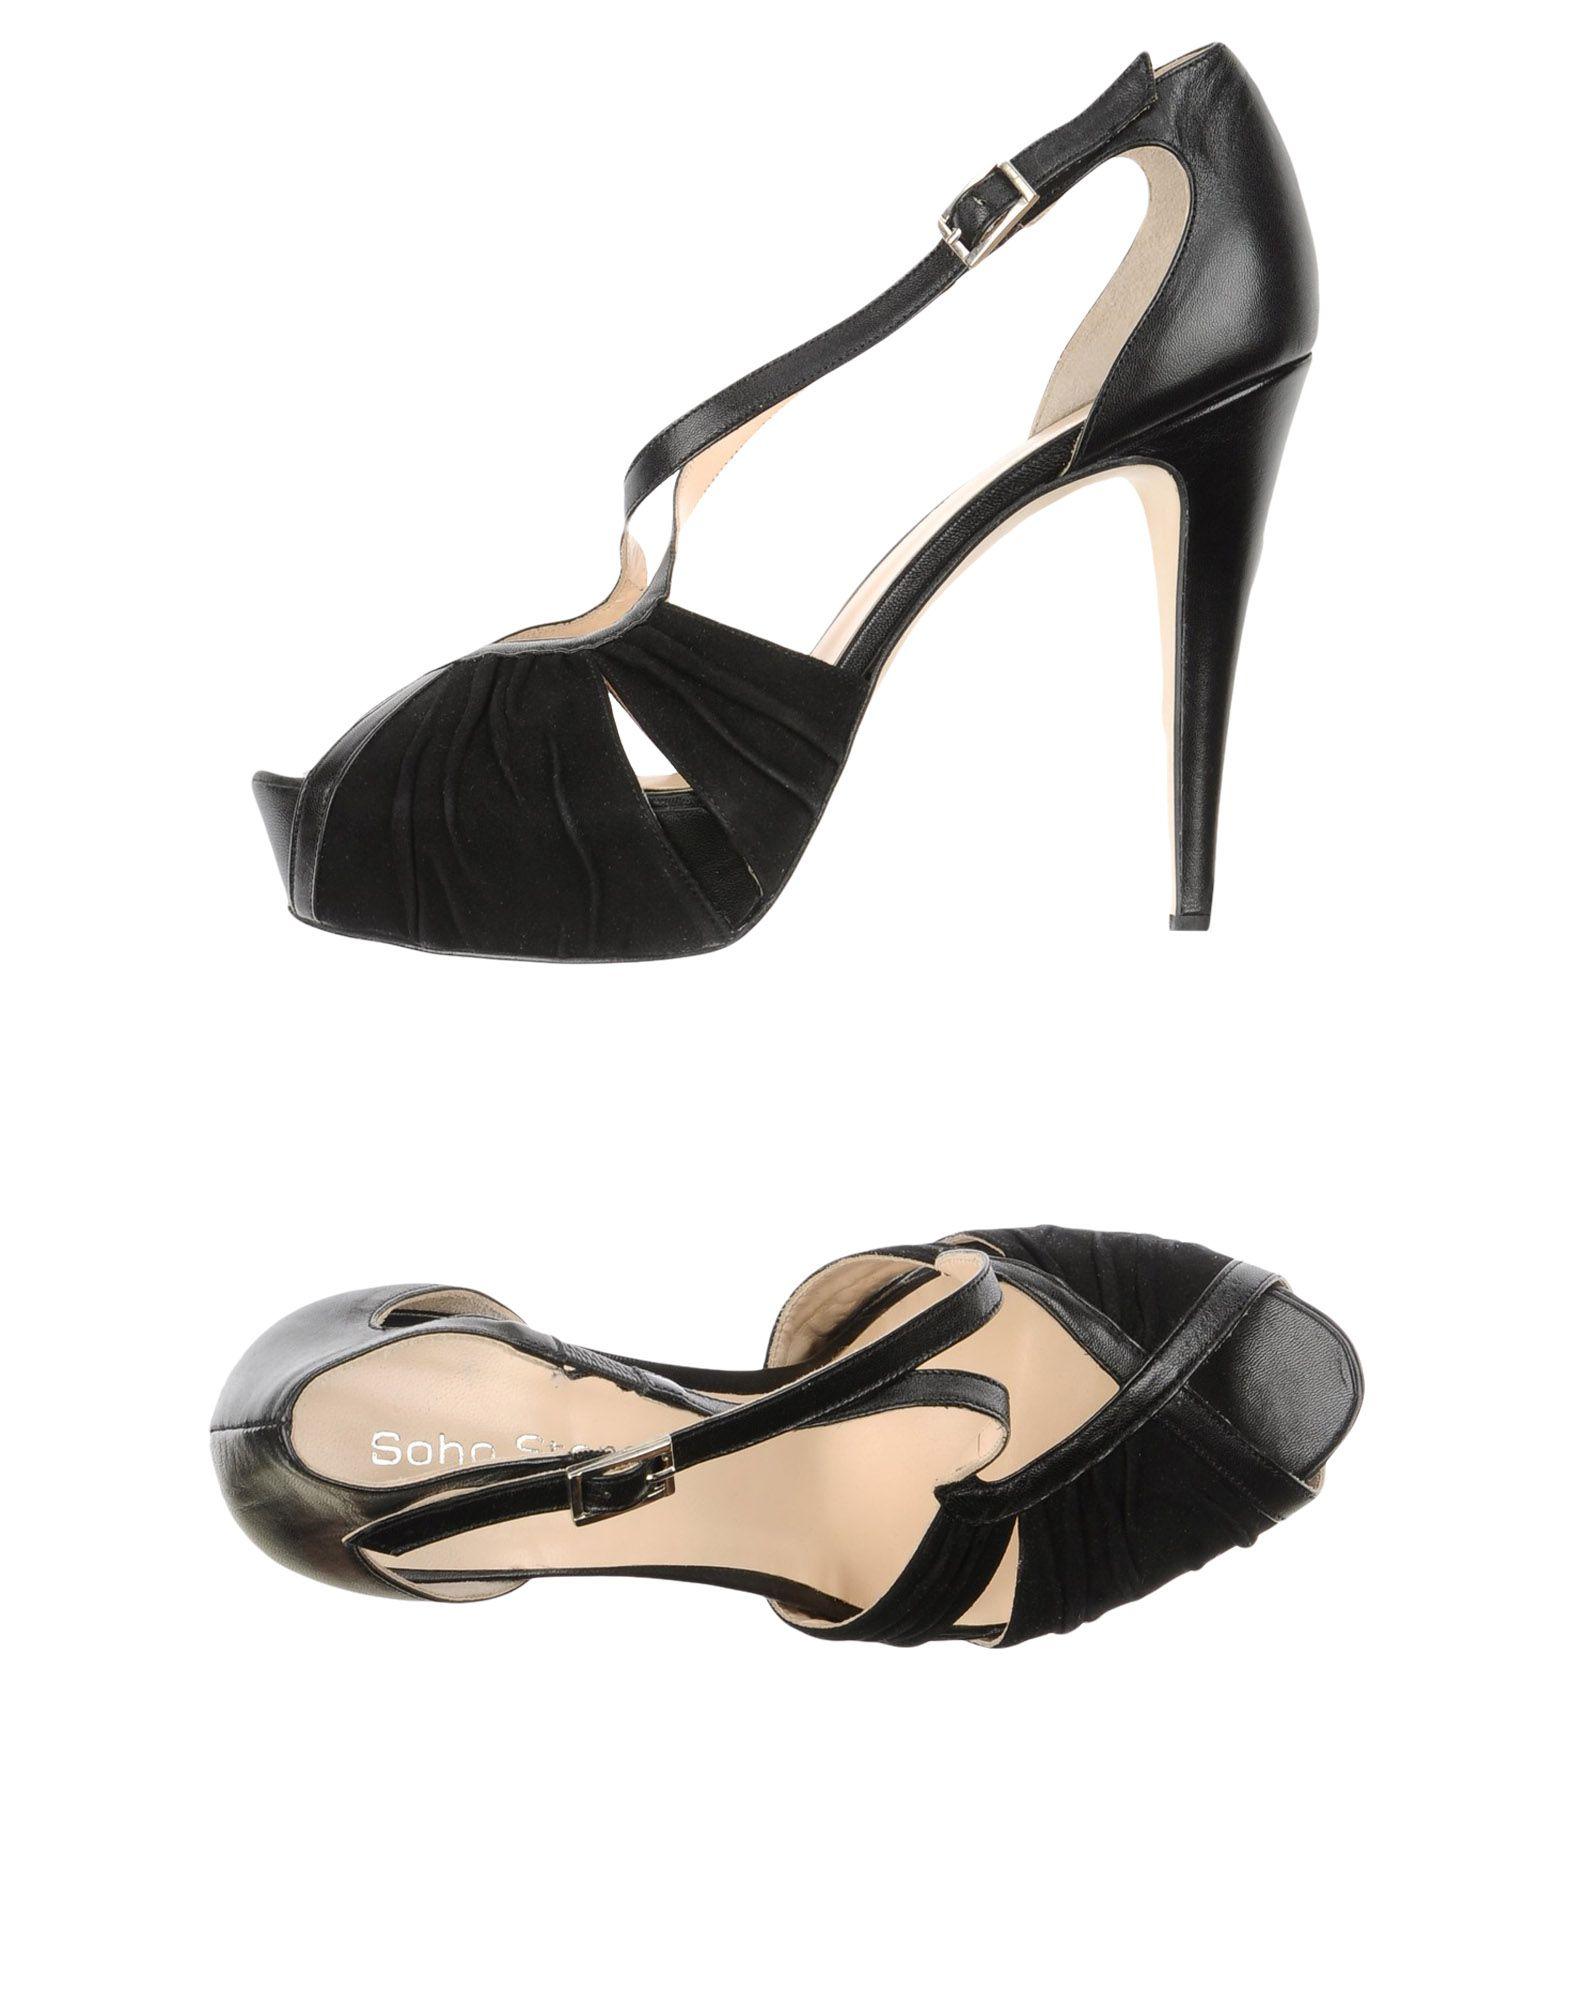 Soho Store Sandals